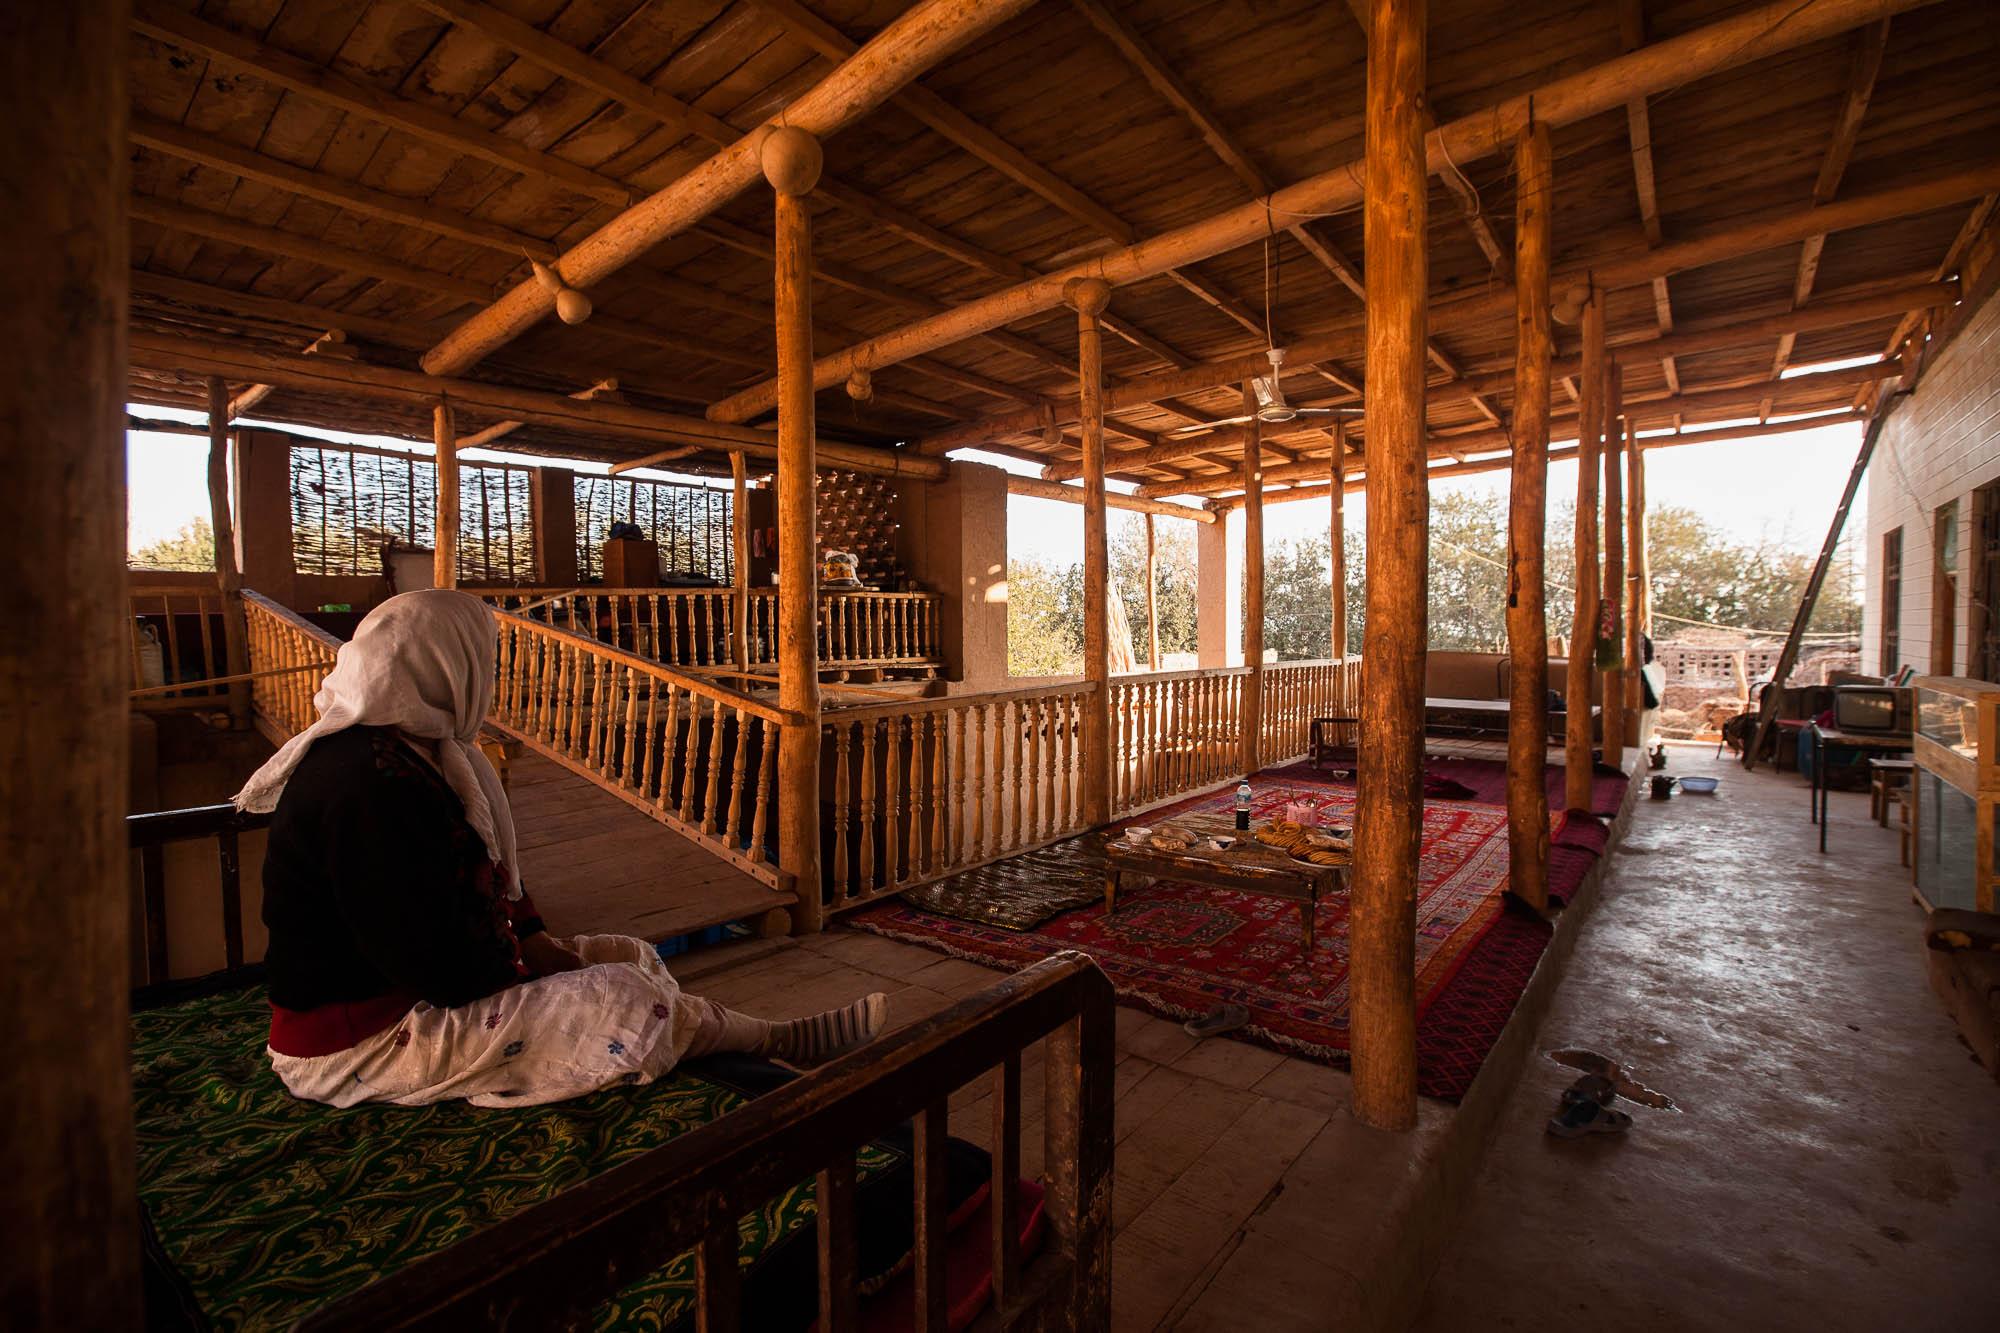 Uyghur house